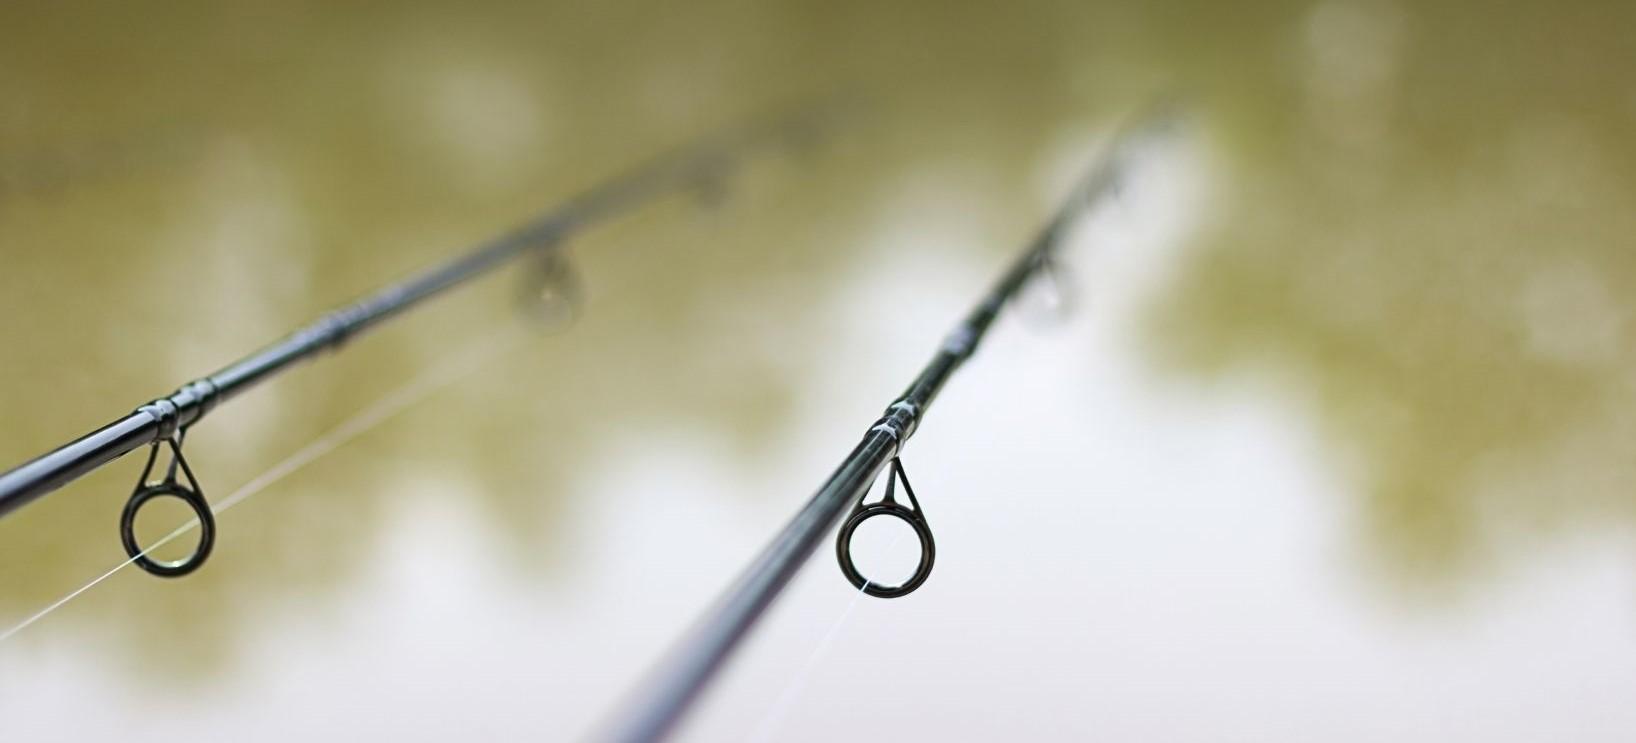 inele lanseta de pescuit